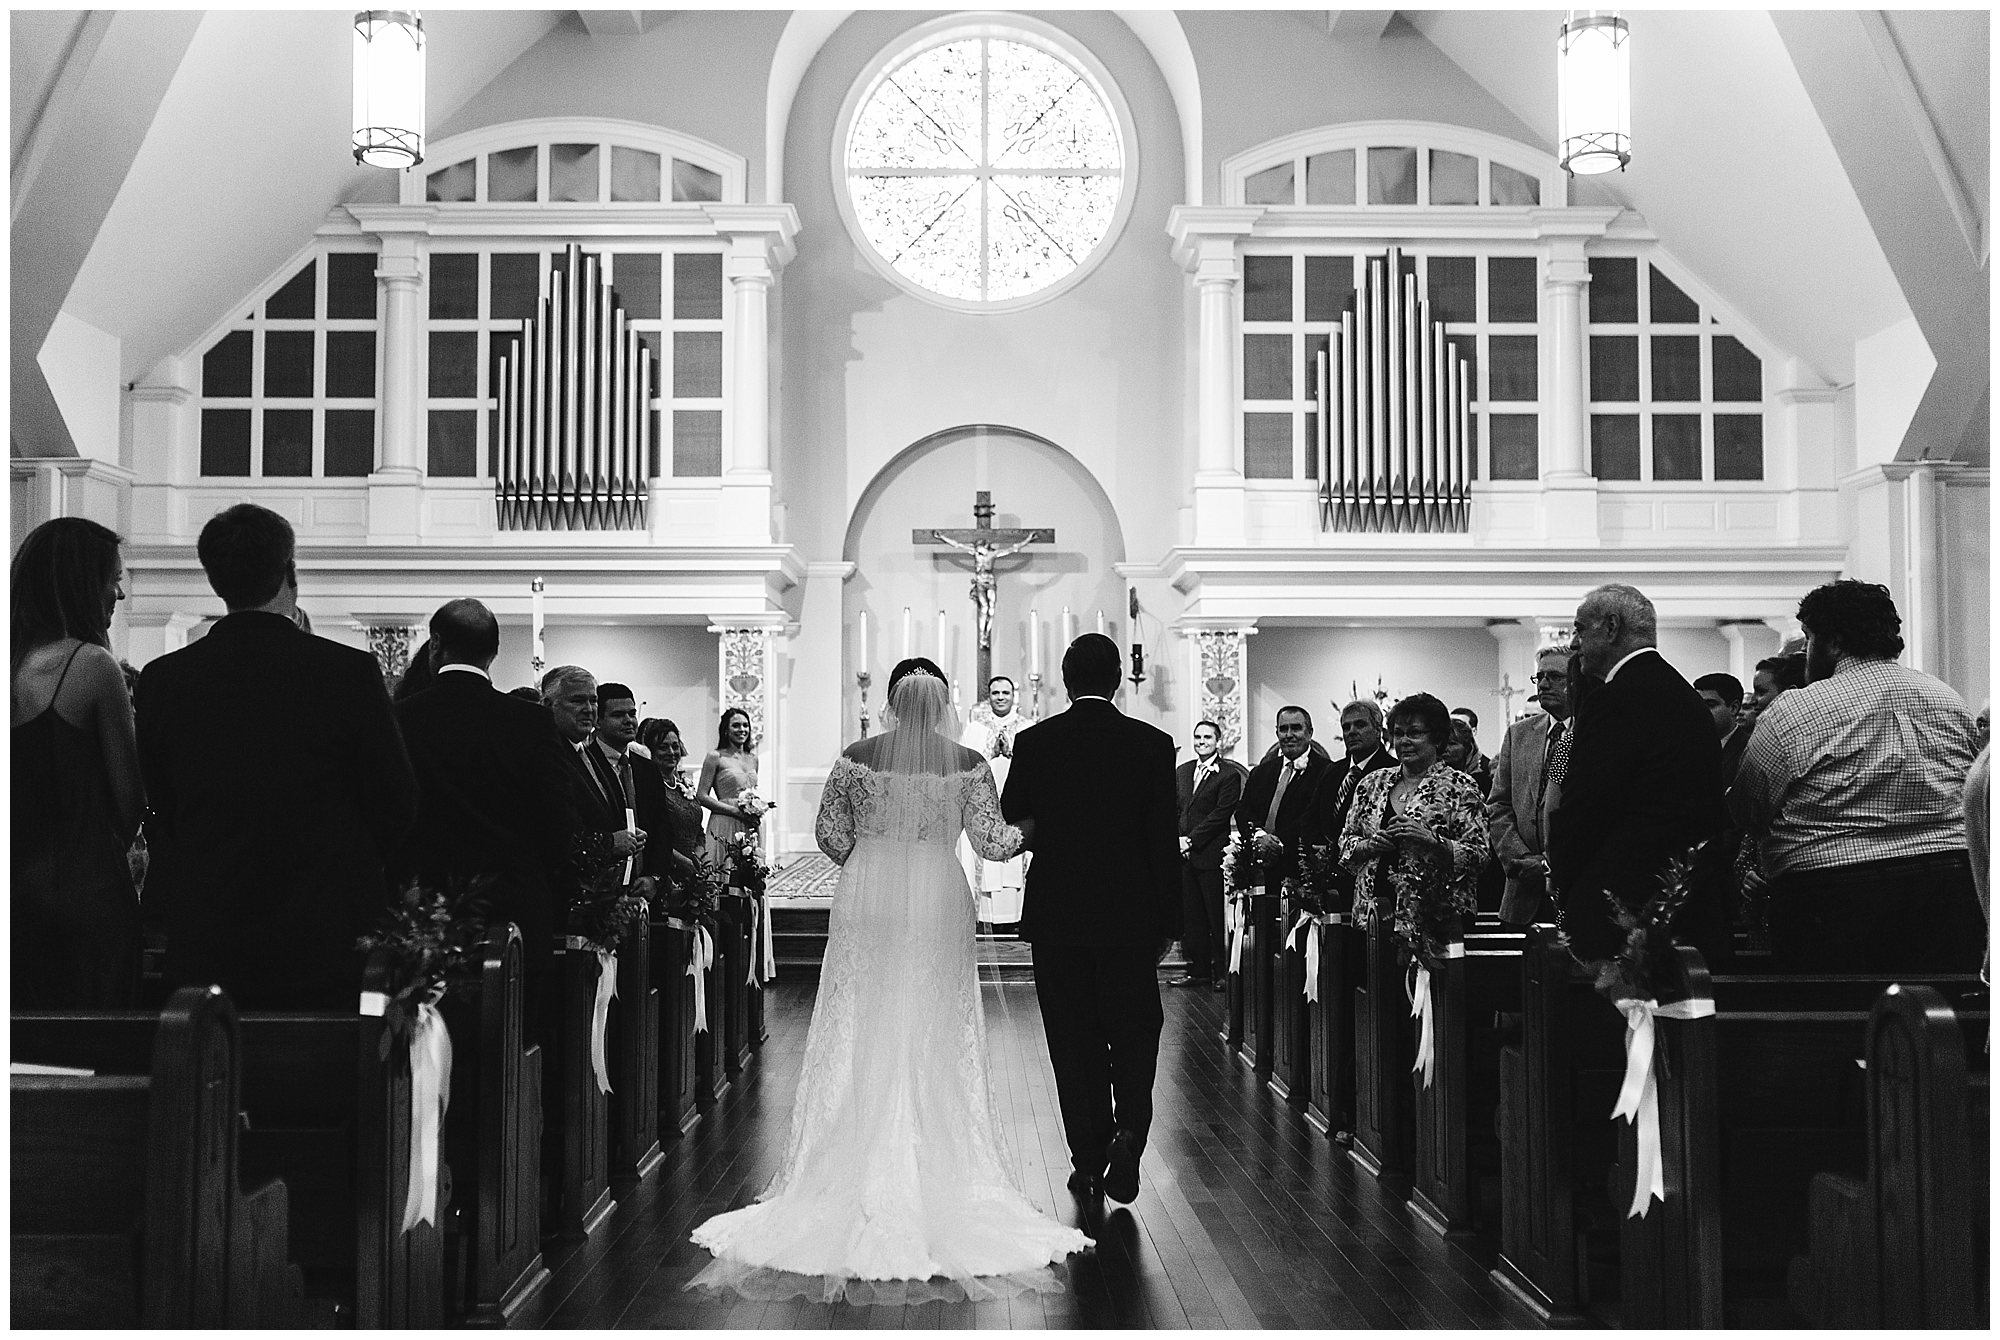 Oaks-at-salem-wedding-apex-photography-59.jpg